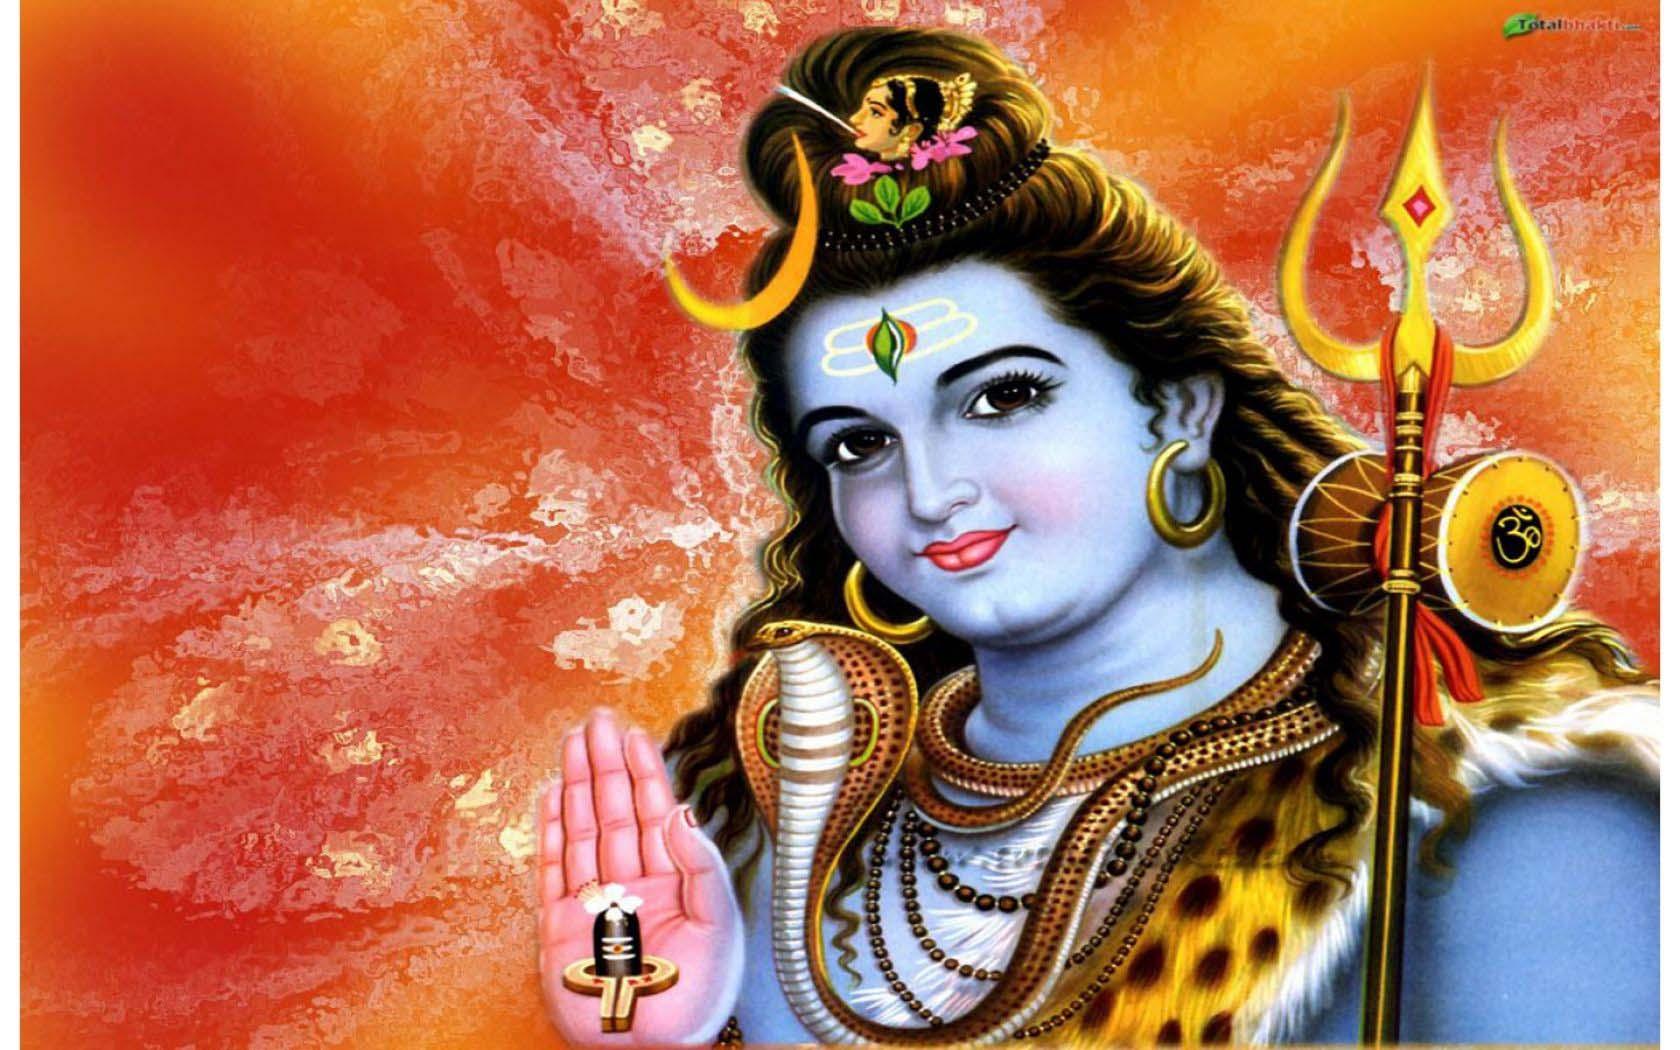 Hd wallpaper bholenath - Lord Shiva Hd Wallpapers